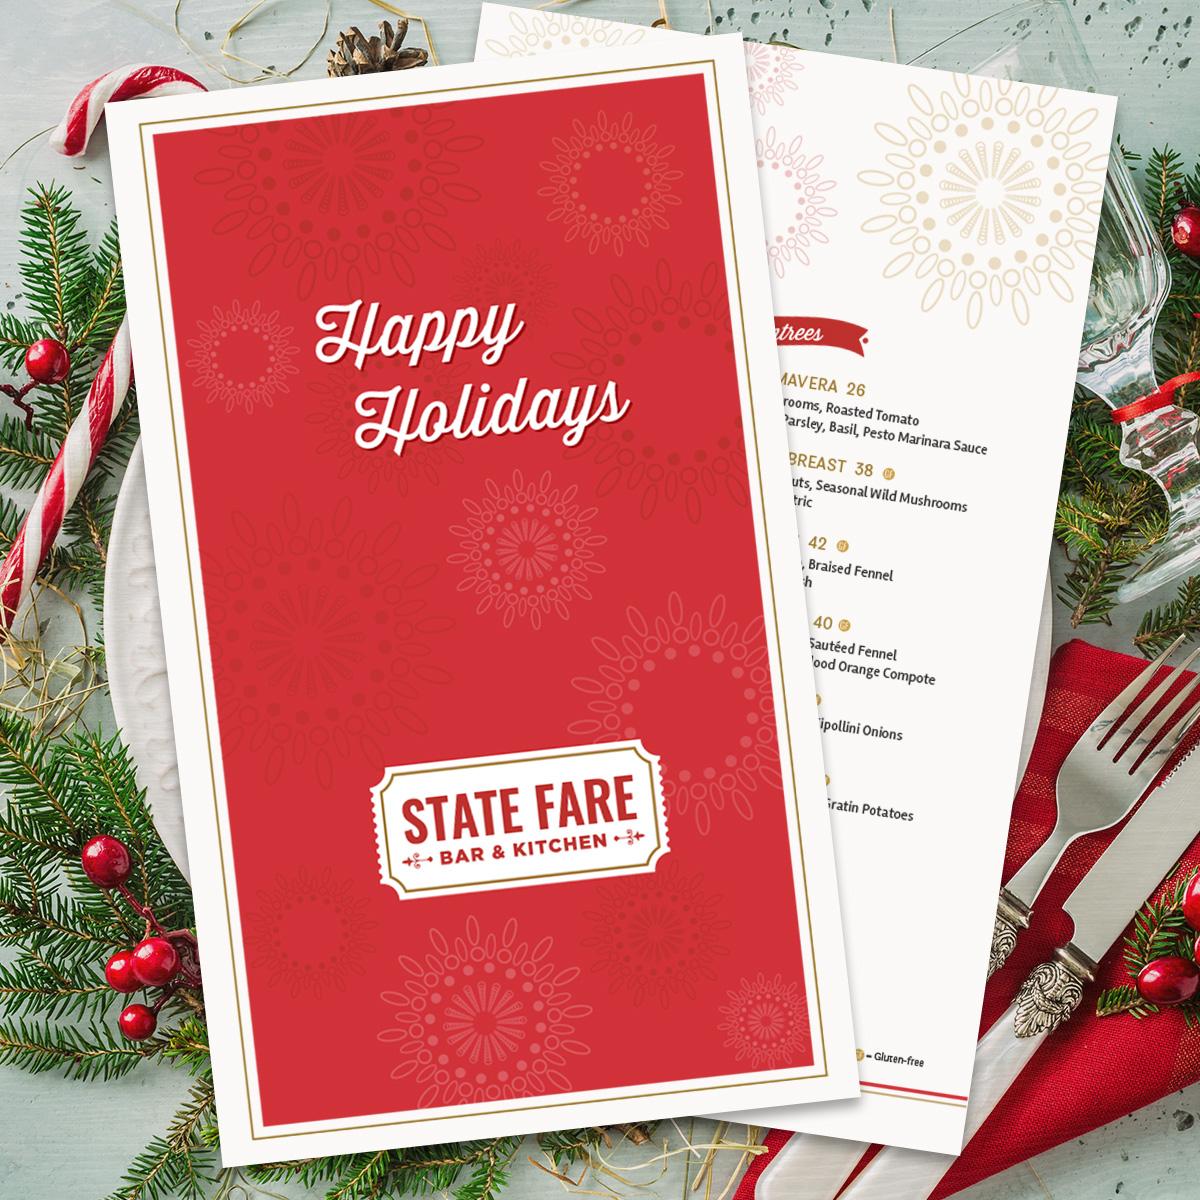 2017 Holiday Menu Design